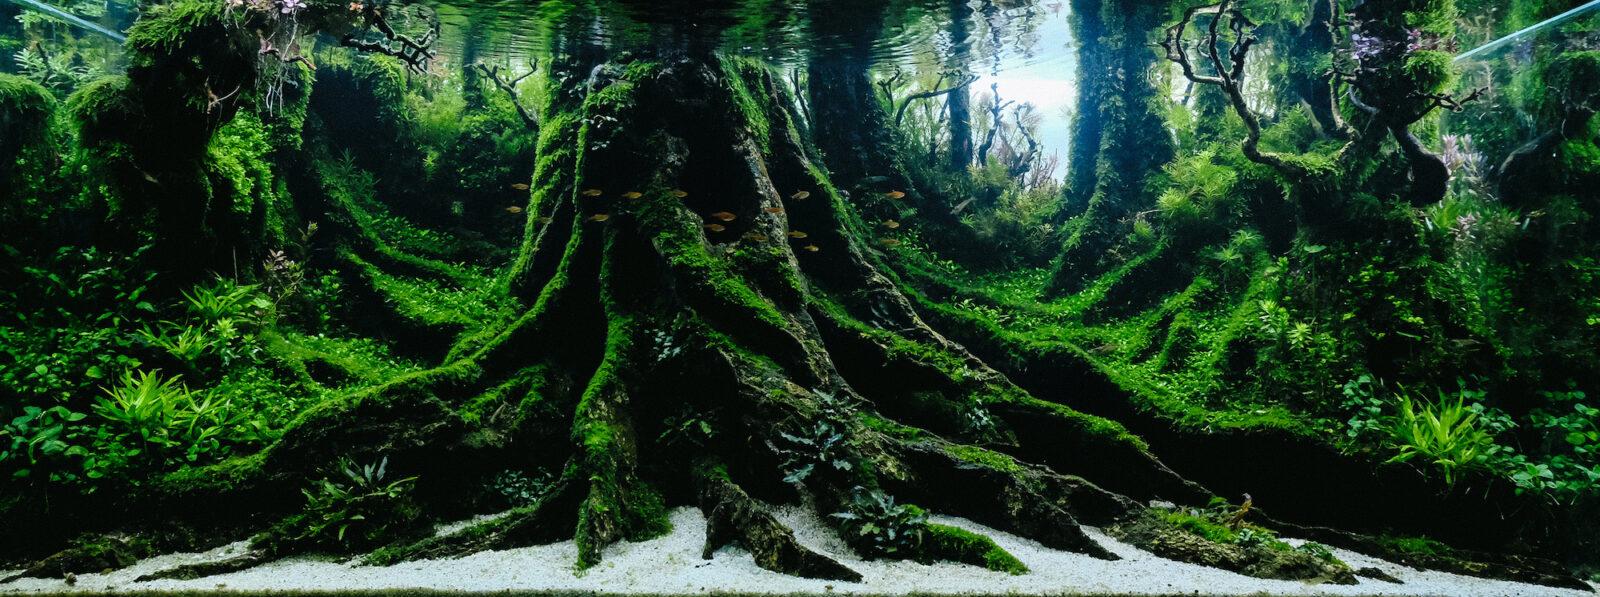 IAPLC2021 WORLD RANKING 1「Ancient Tree」 YOYO PRAYPGI/INDONESIA。